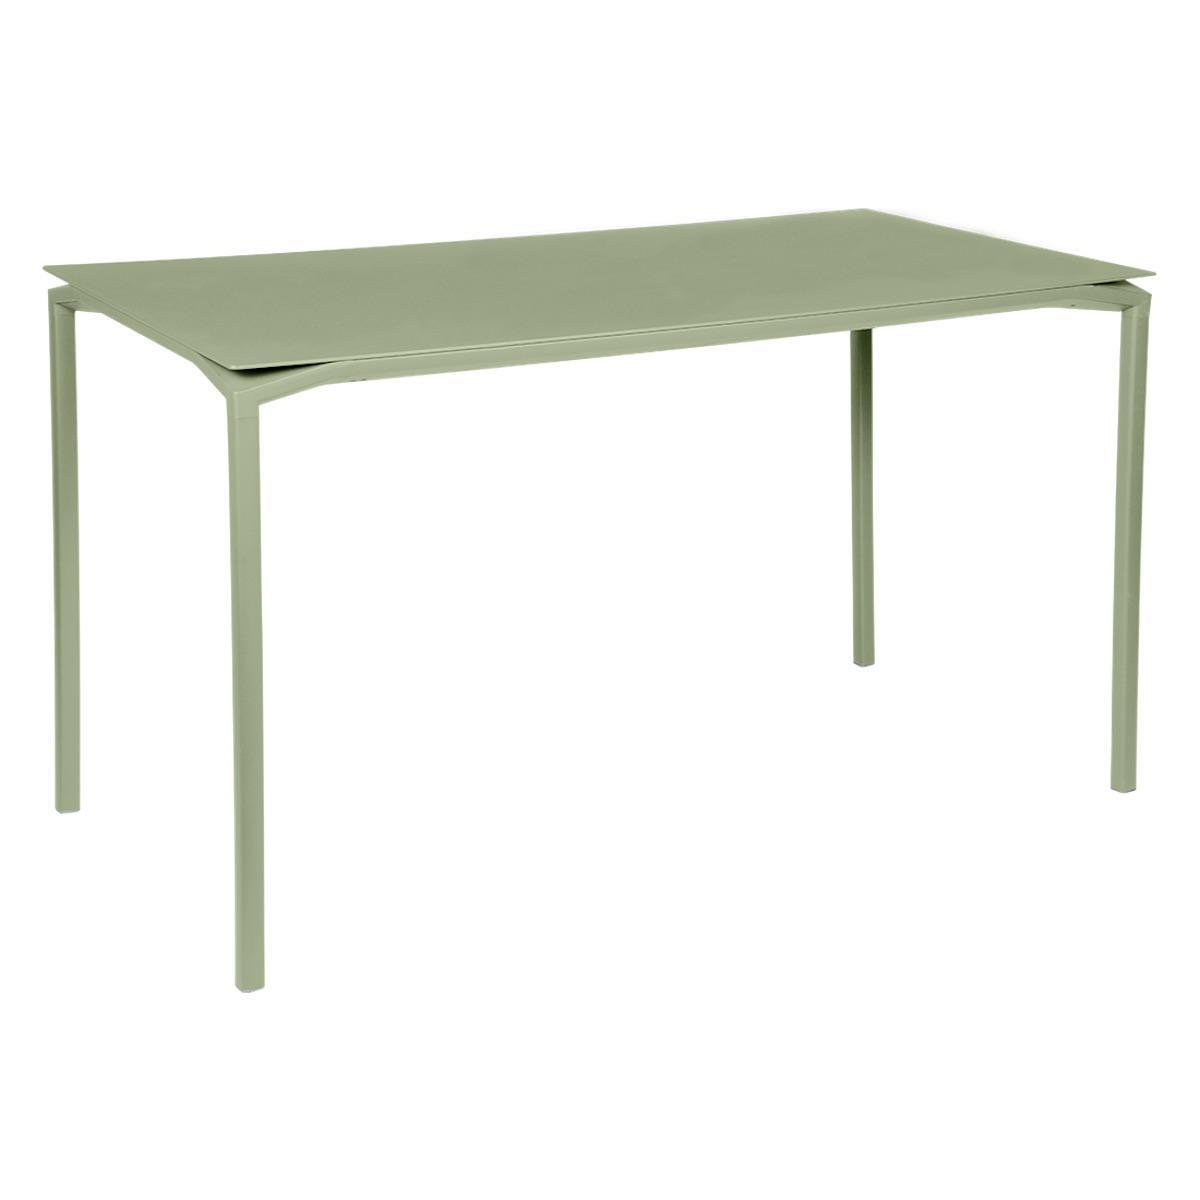 Table 80x160cm CALVI Fermob vert tilleul